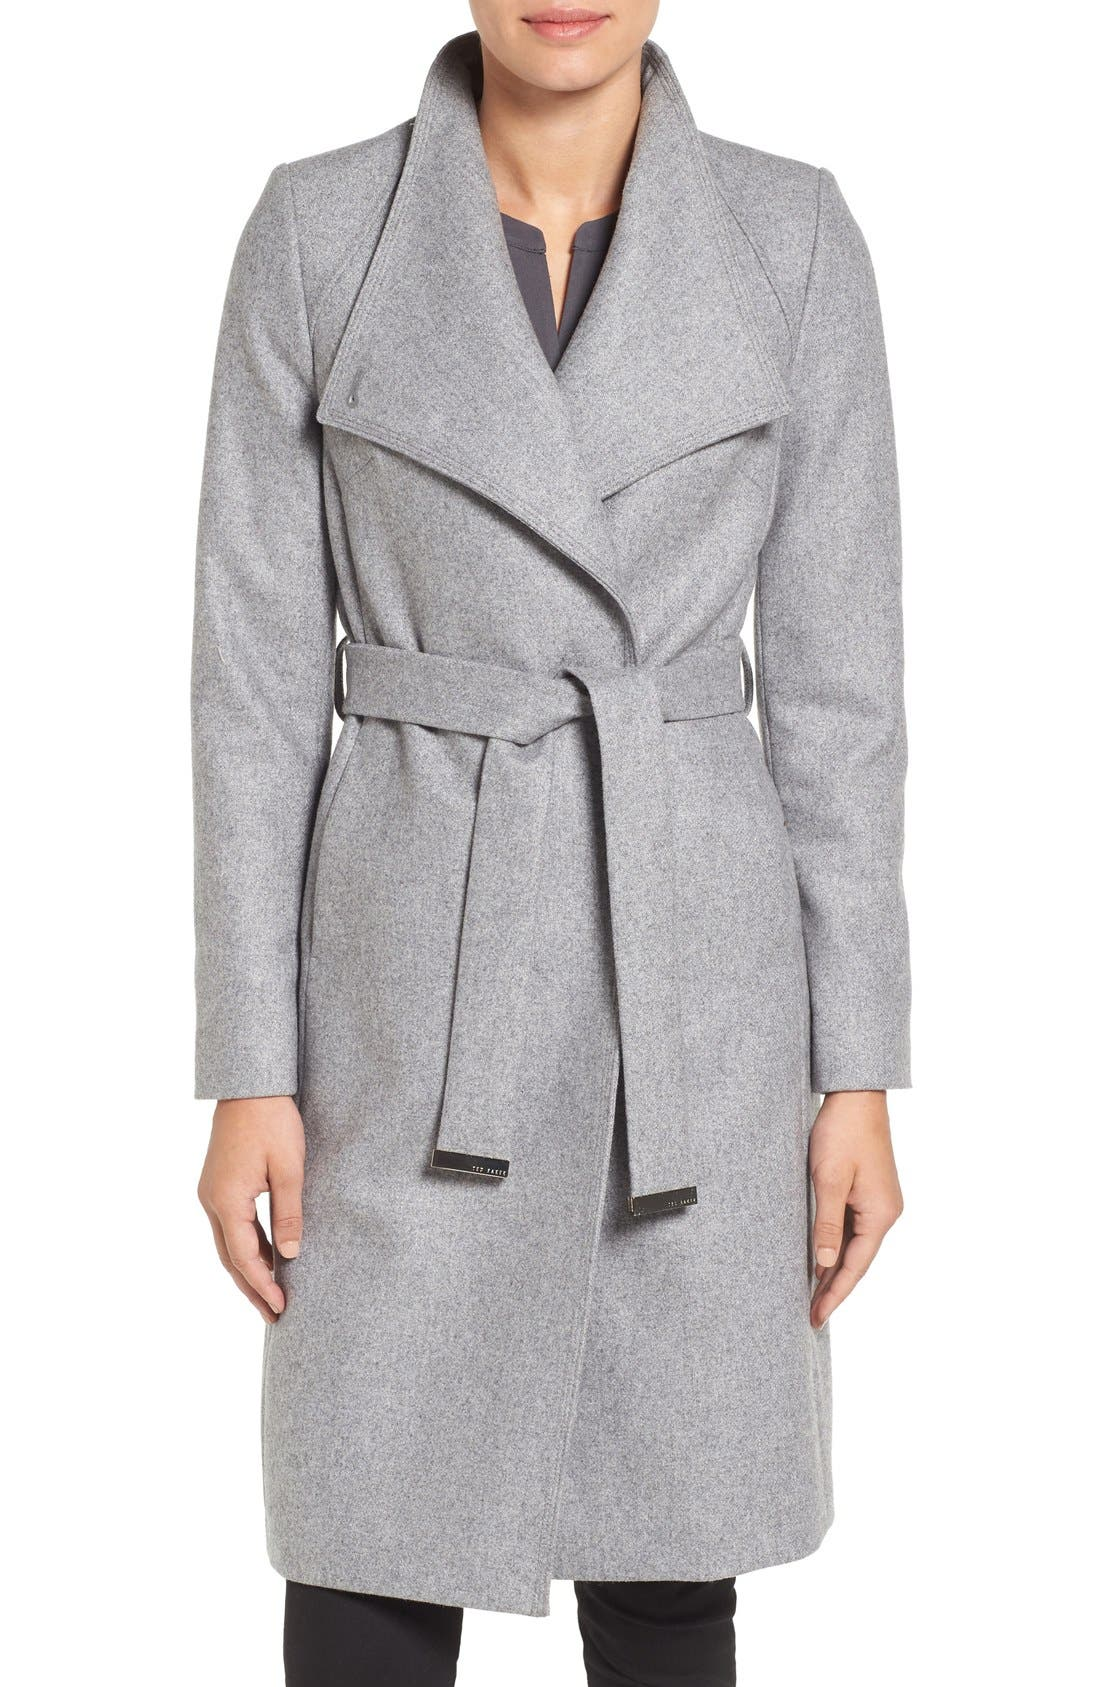 Alternate Image 1 Selected - Ted Baker London Wrap Coat